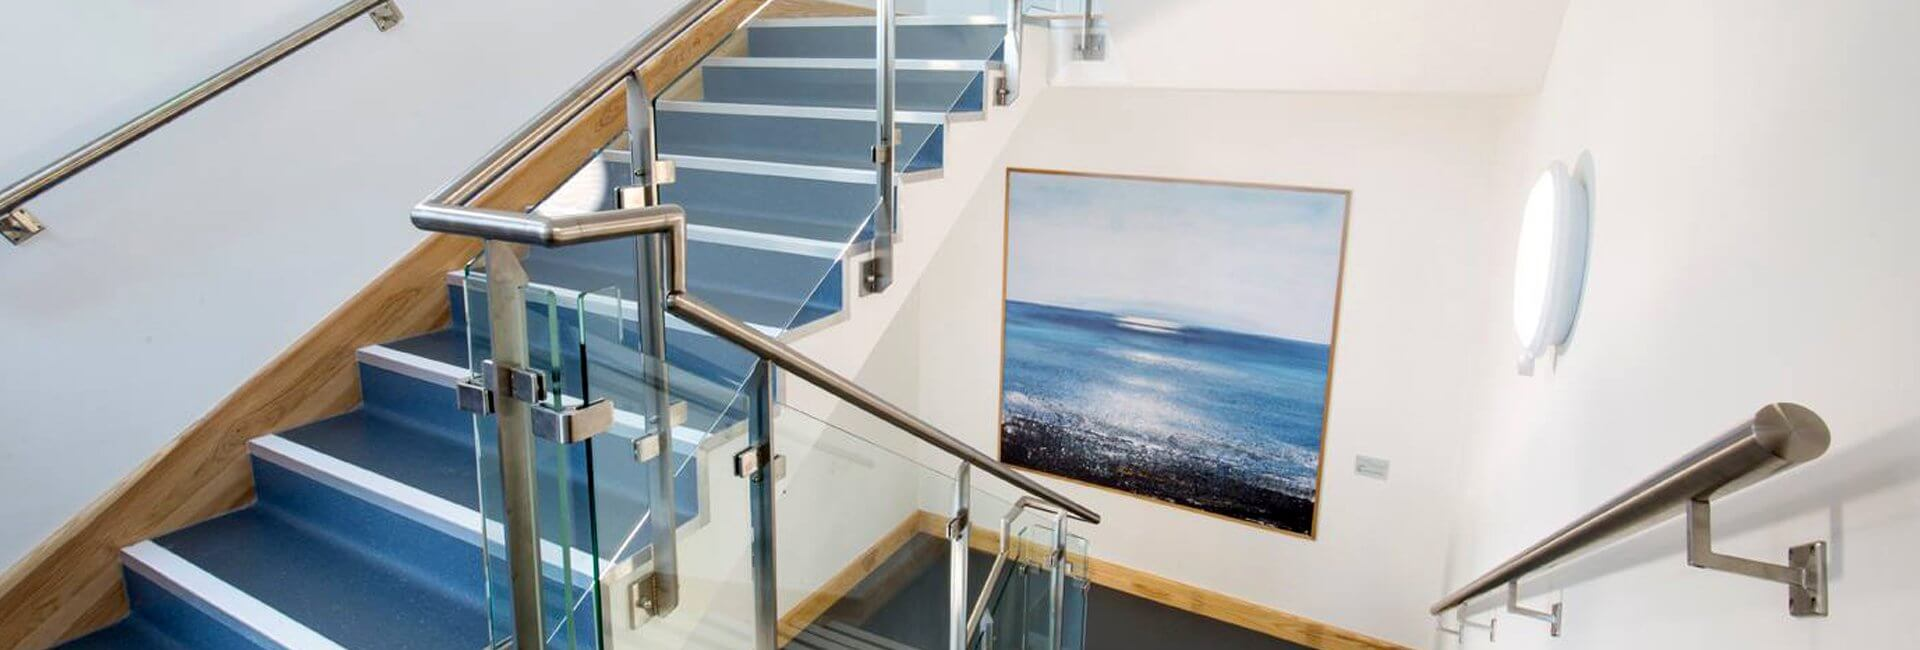 Glass Railings Stairs Slide1